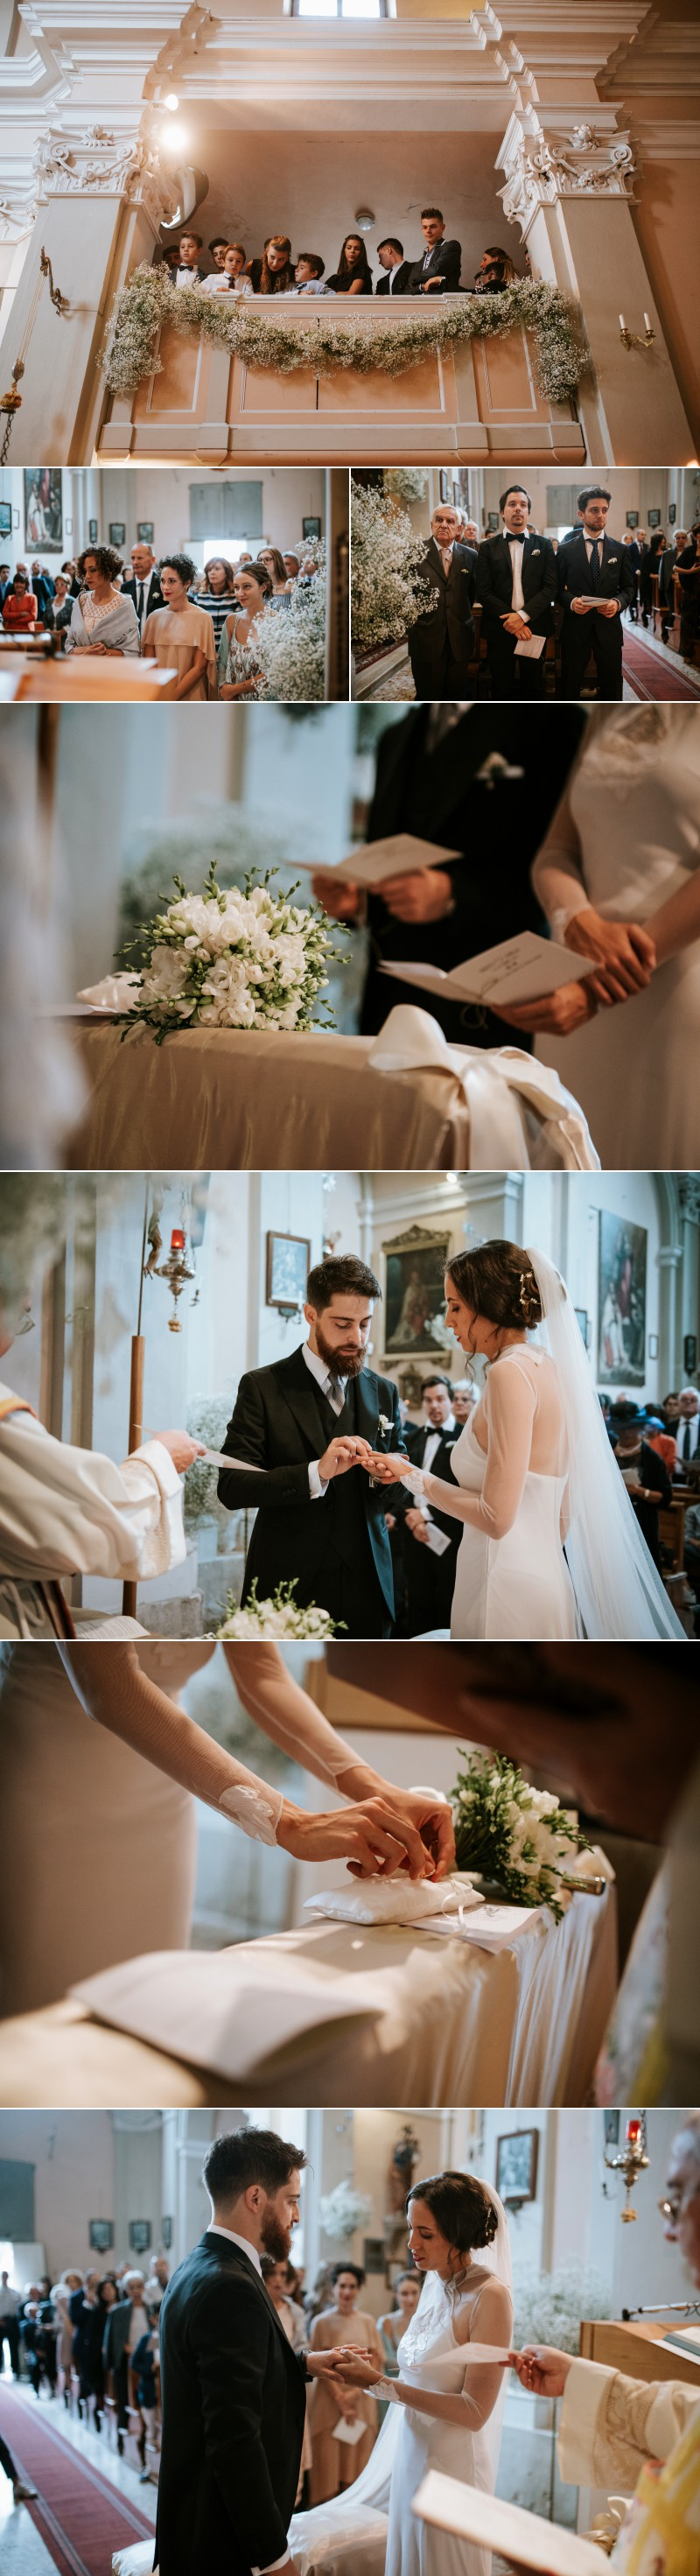 Bologna Ravenna Destination Wedding Photographer 4